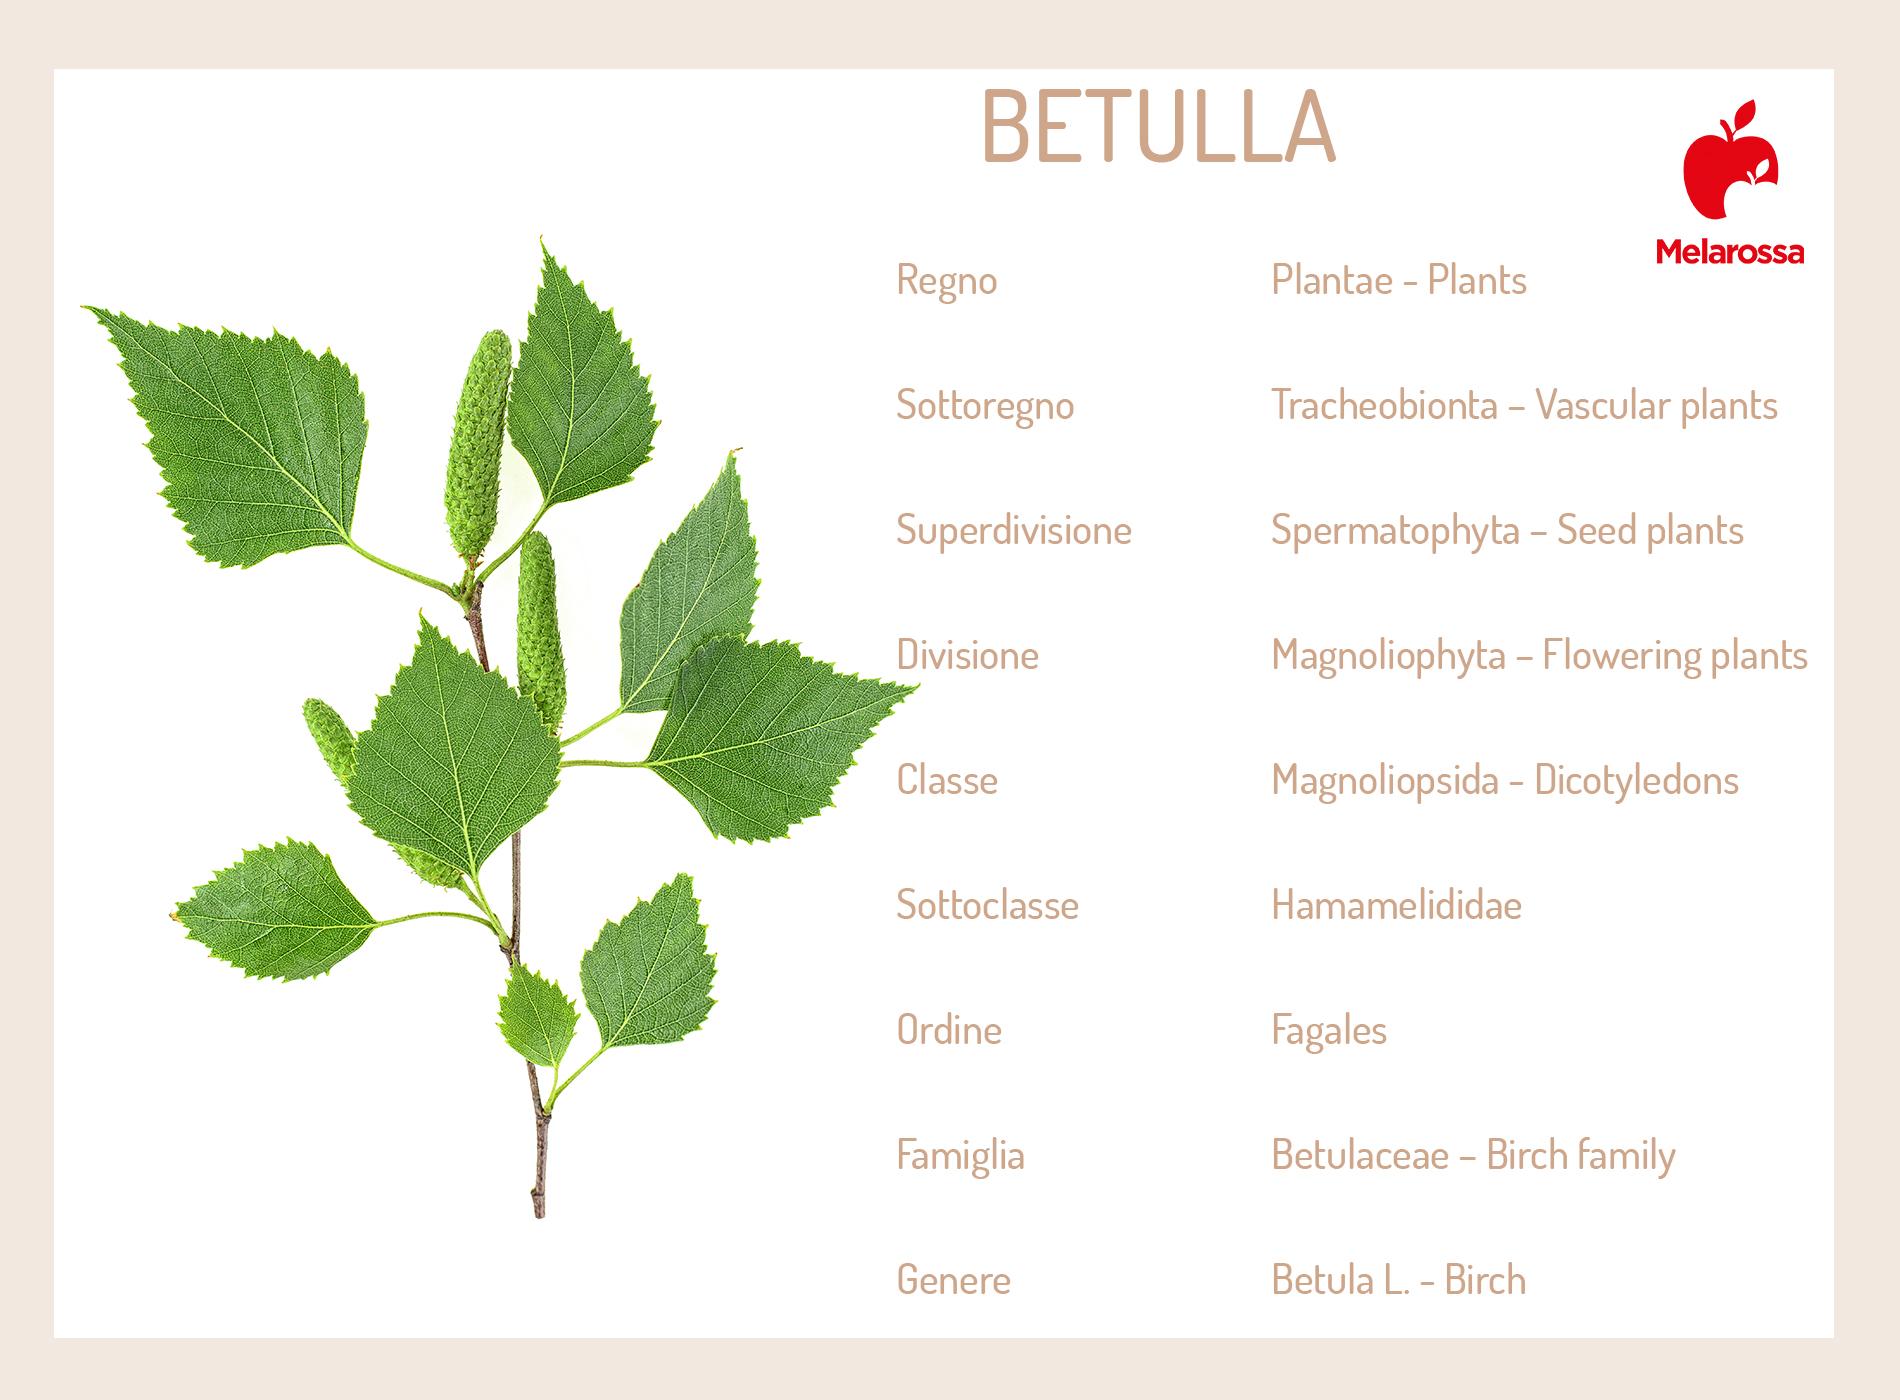 betulla: botanica